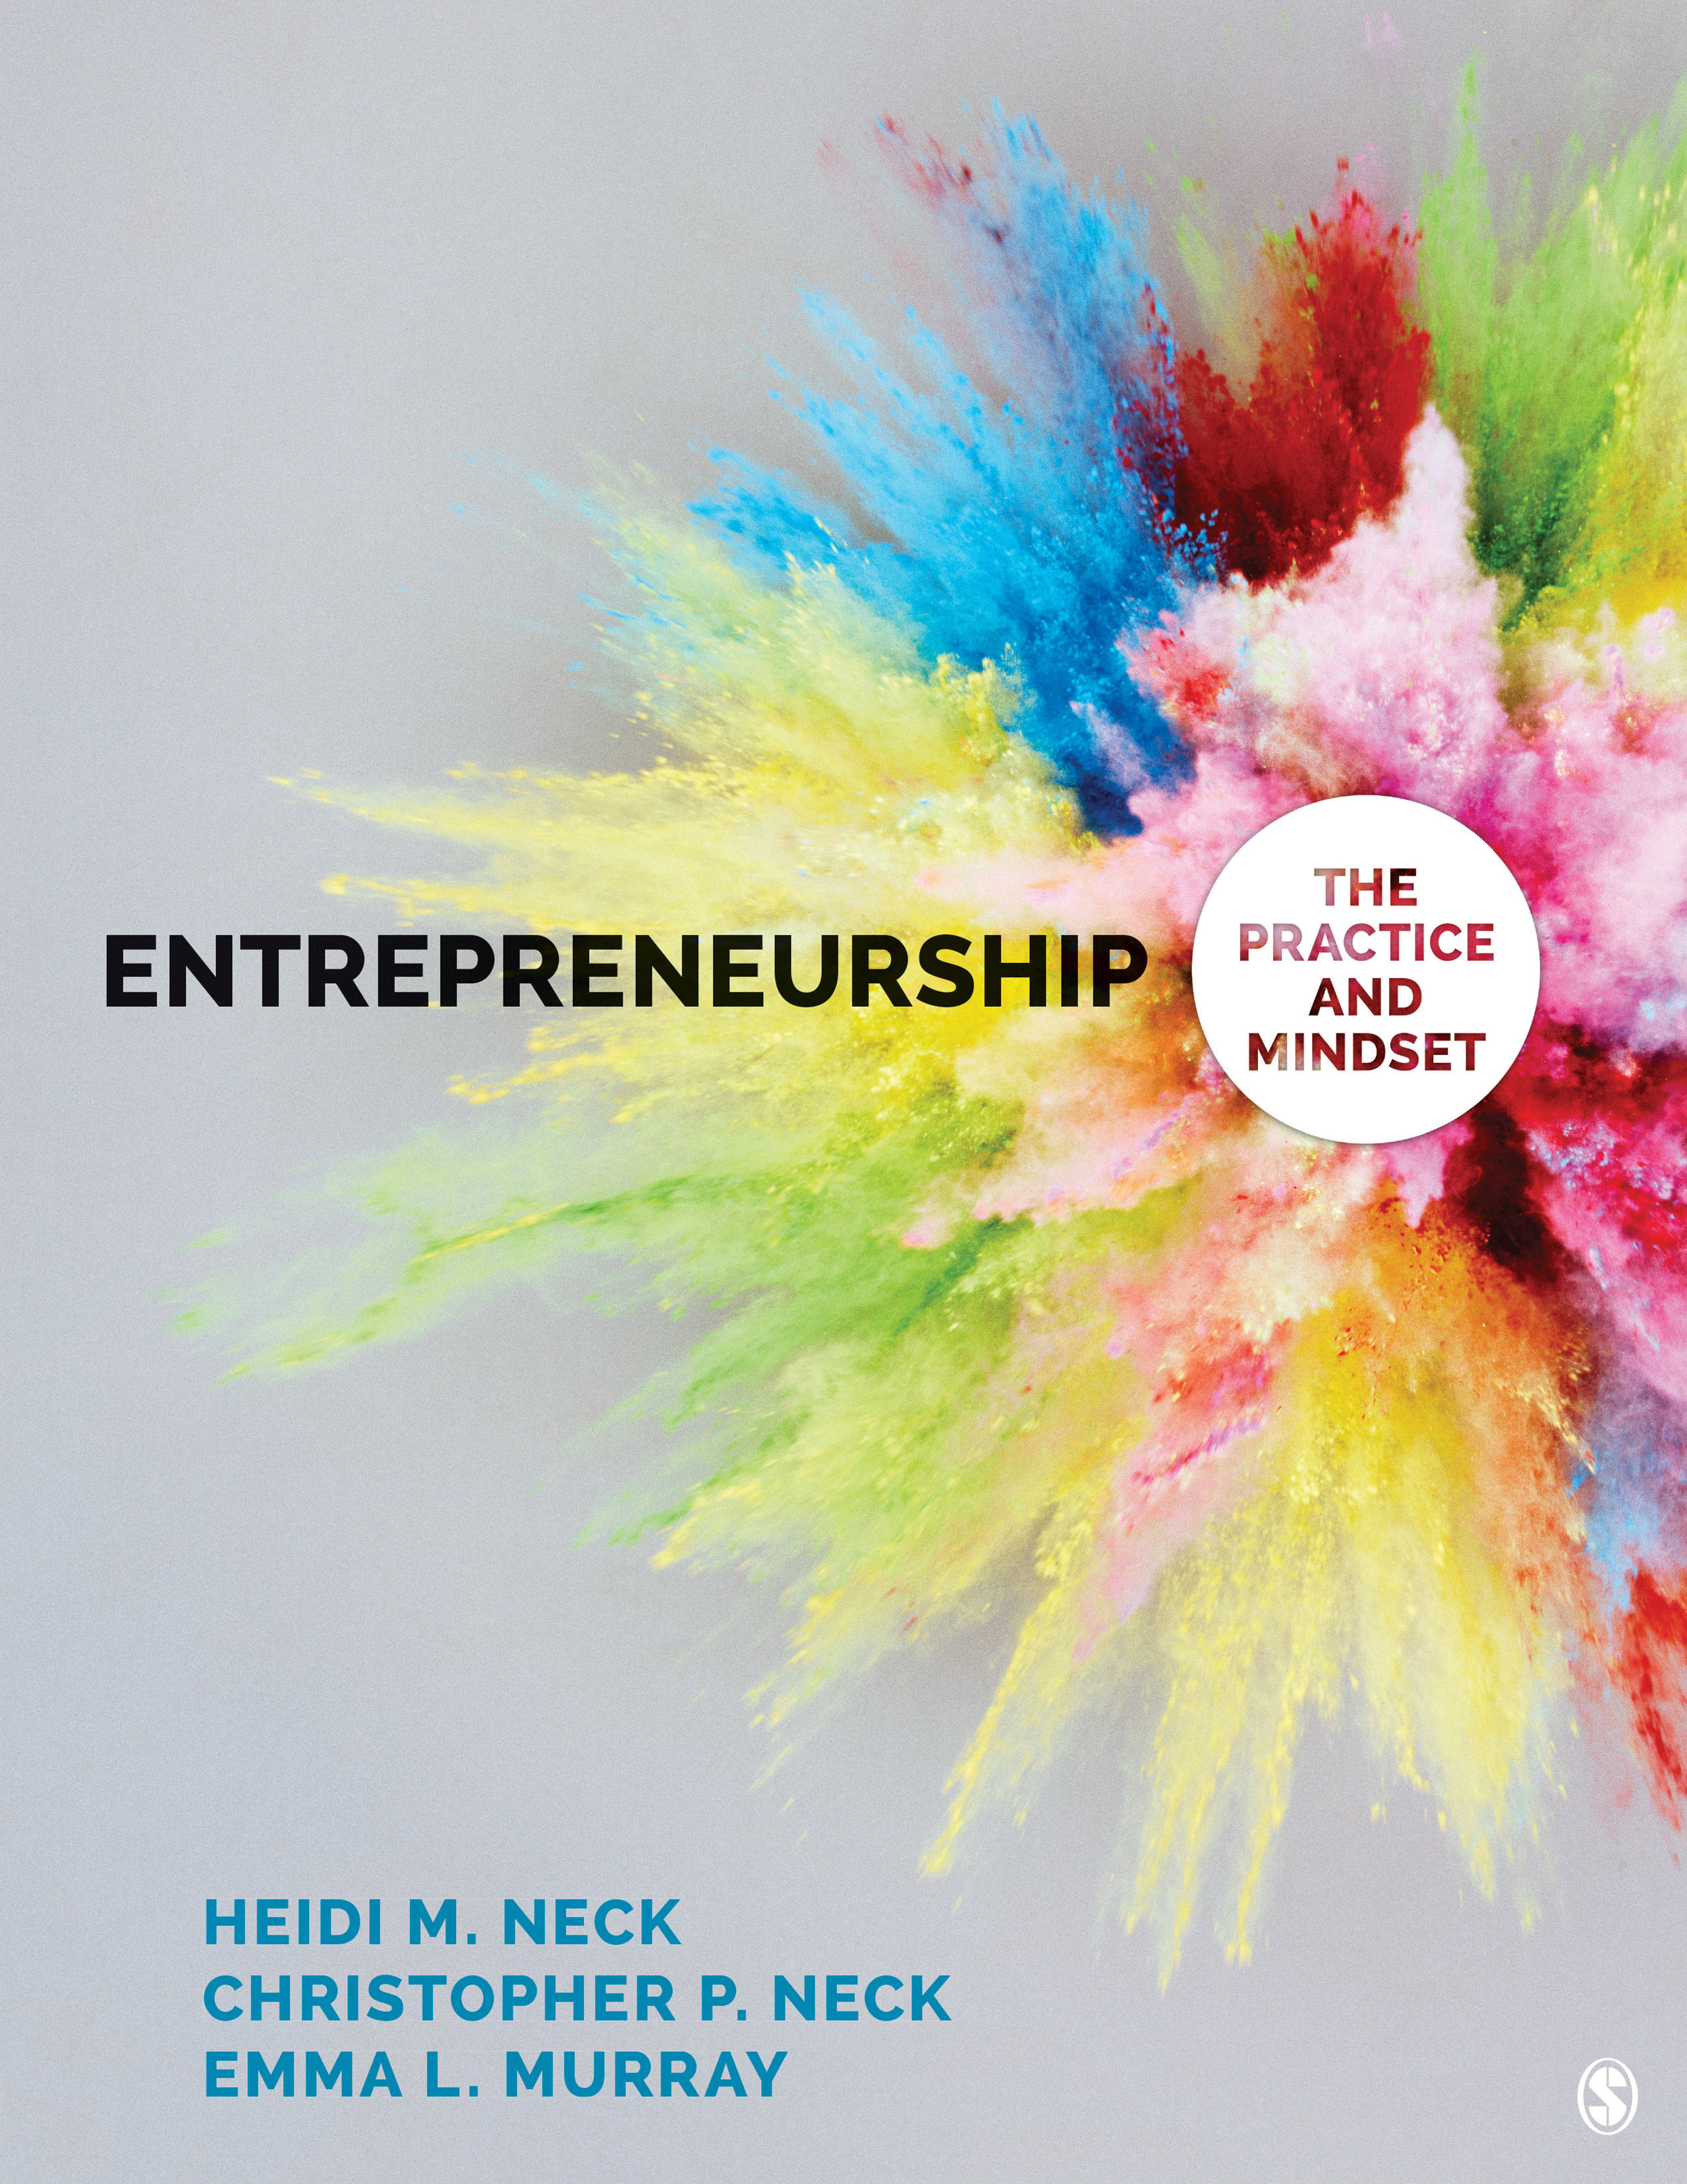 Download Ebook Entrepreneurship by Heidi M. Neck Pdf